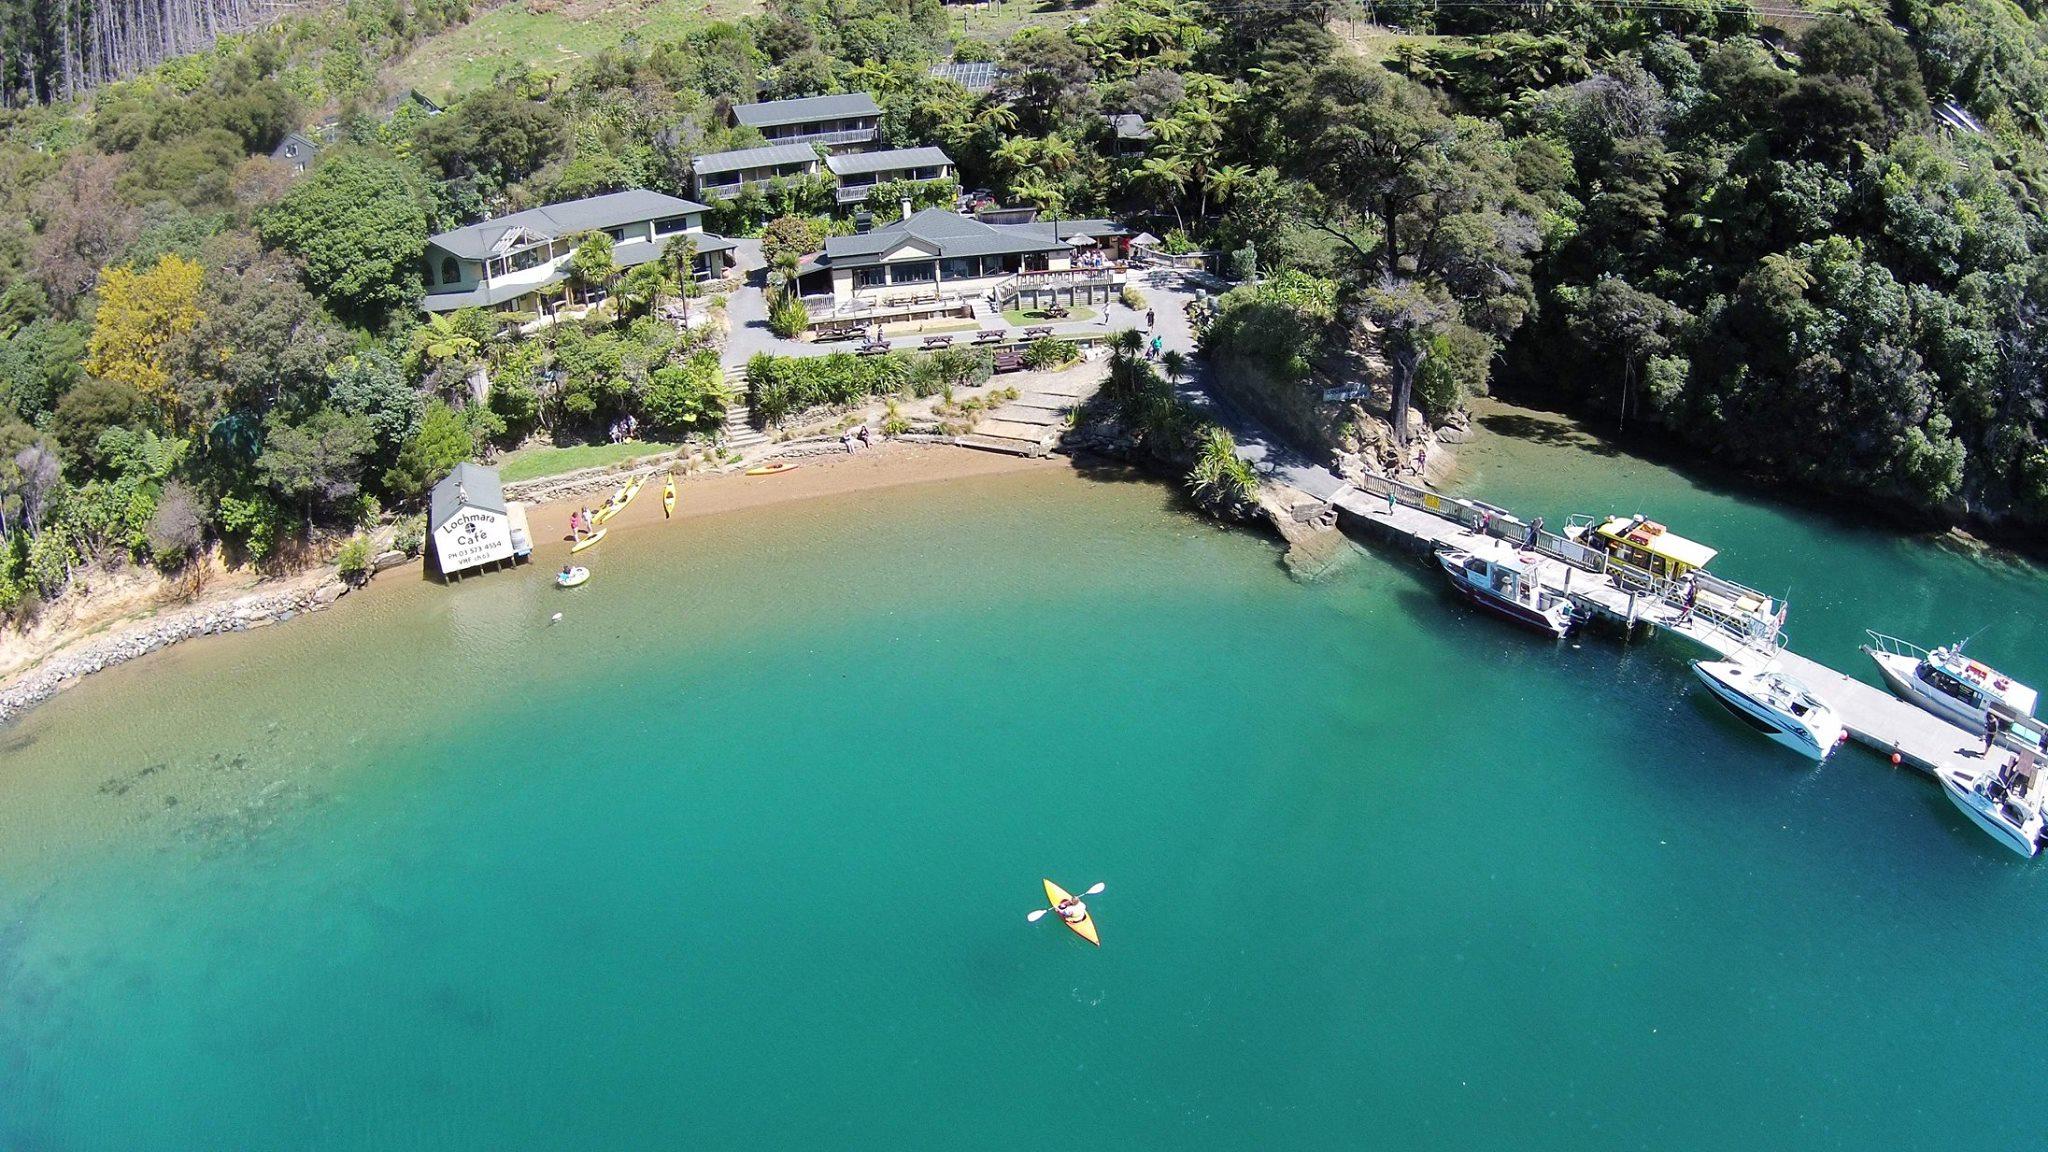 NEW ZEALAND: Lochmara Lodge, Marlborough Sounds